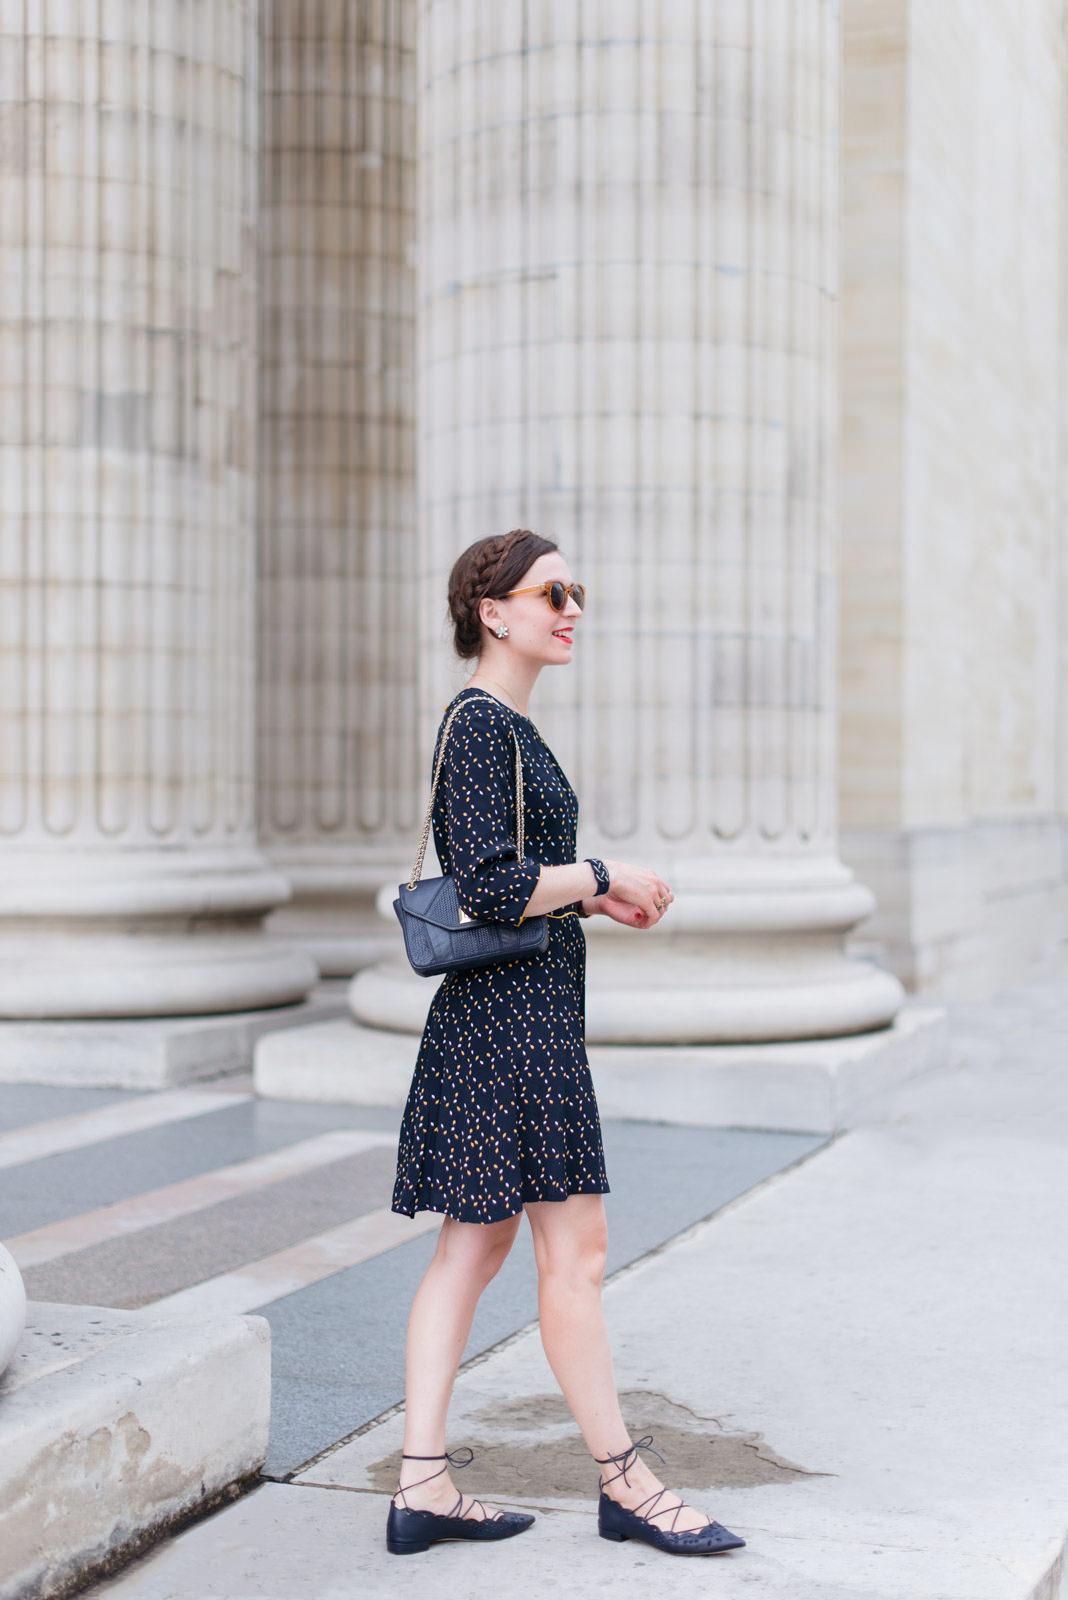 Blog-Mode-And-The-City-Looks-La-Petite-Francaise-2